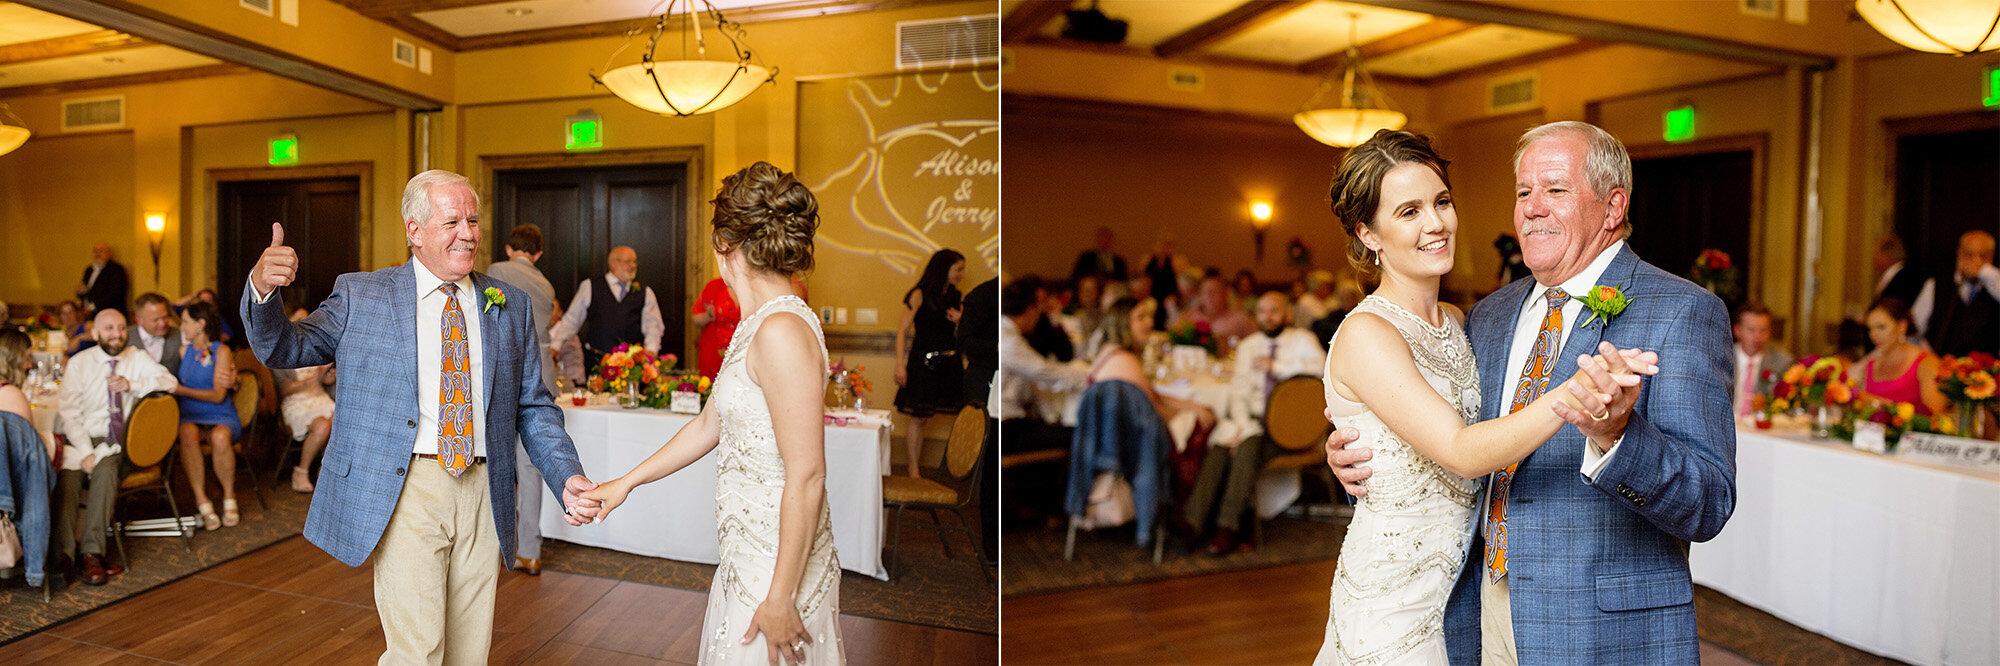 Seriously_Sabrina_Photography_Colorado_Springs_Club_at_Flying_Horse_Destination_Wedding_ODwyer117.jpg